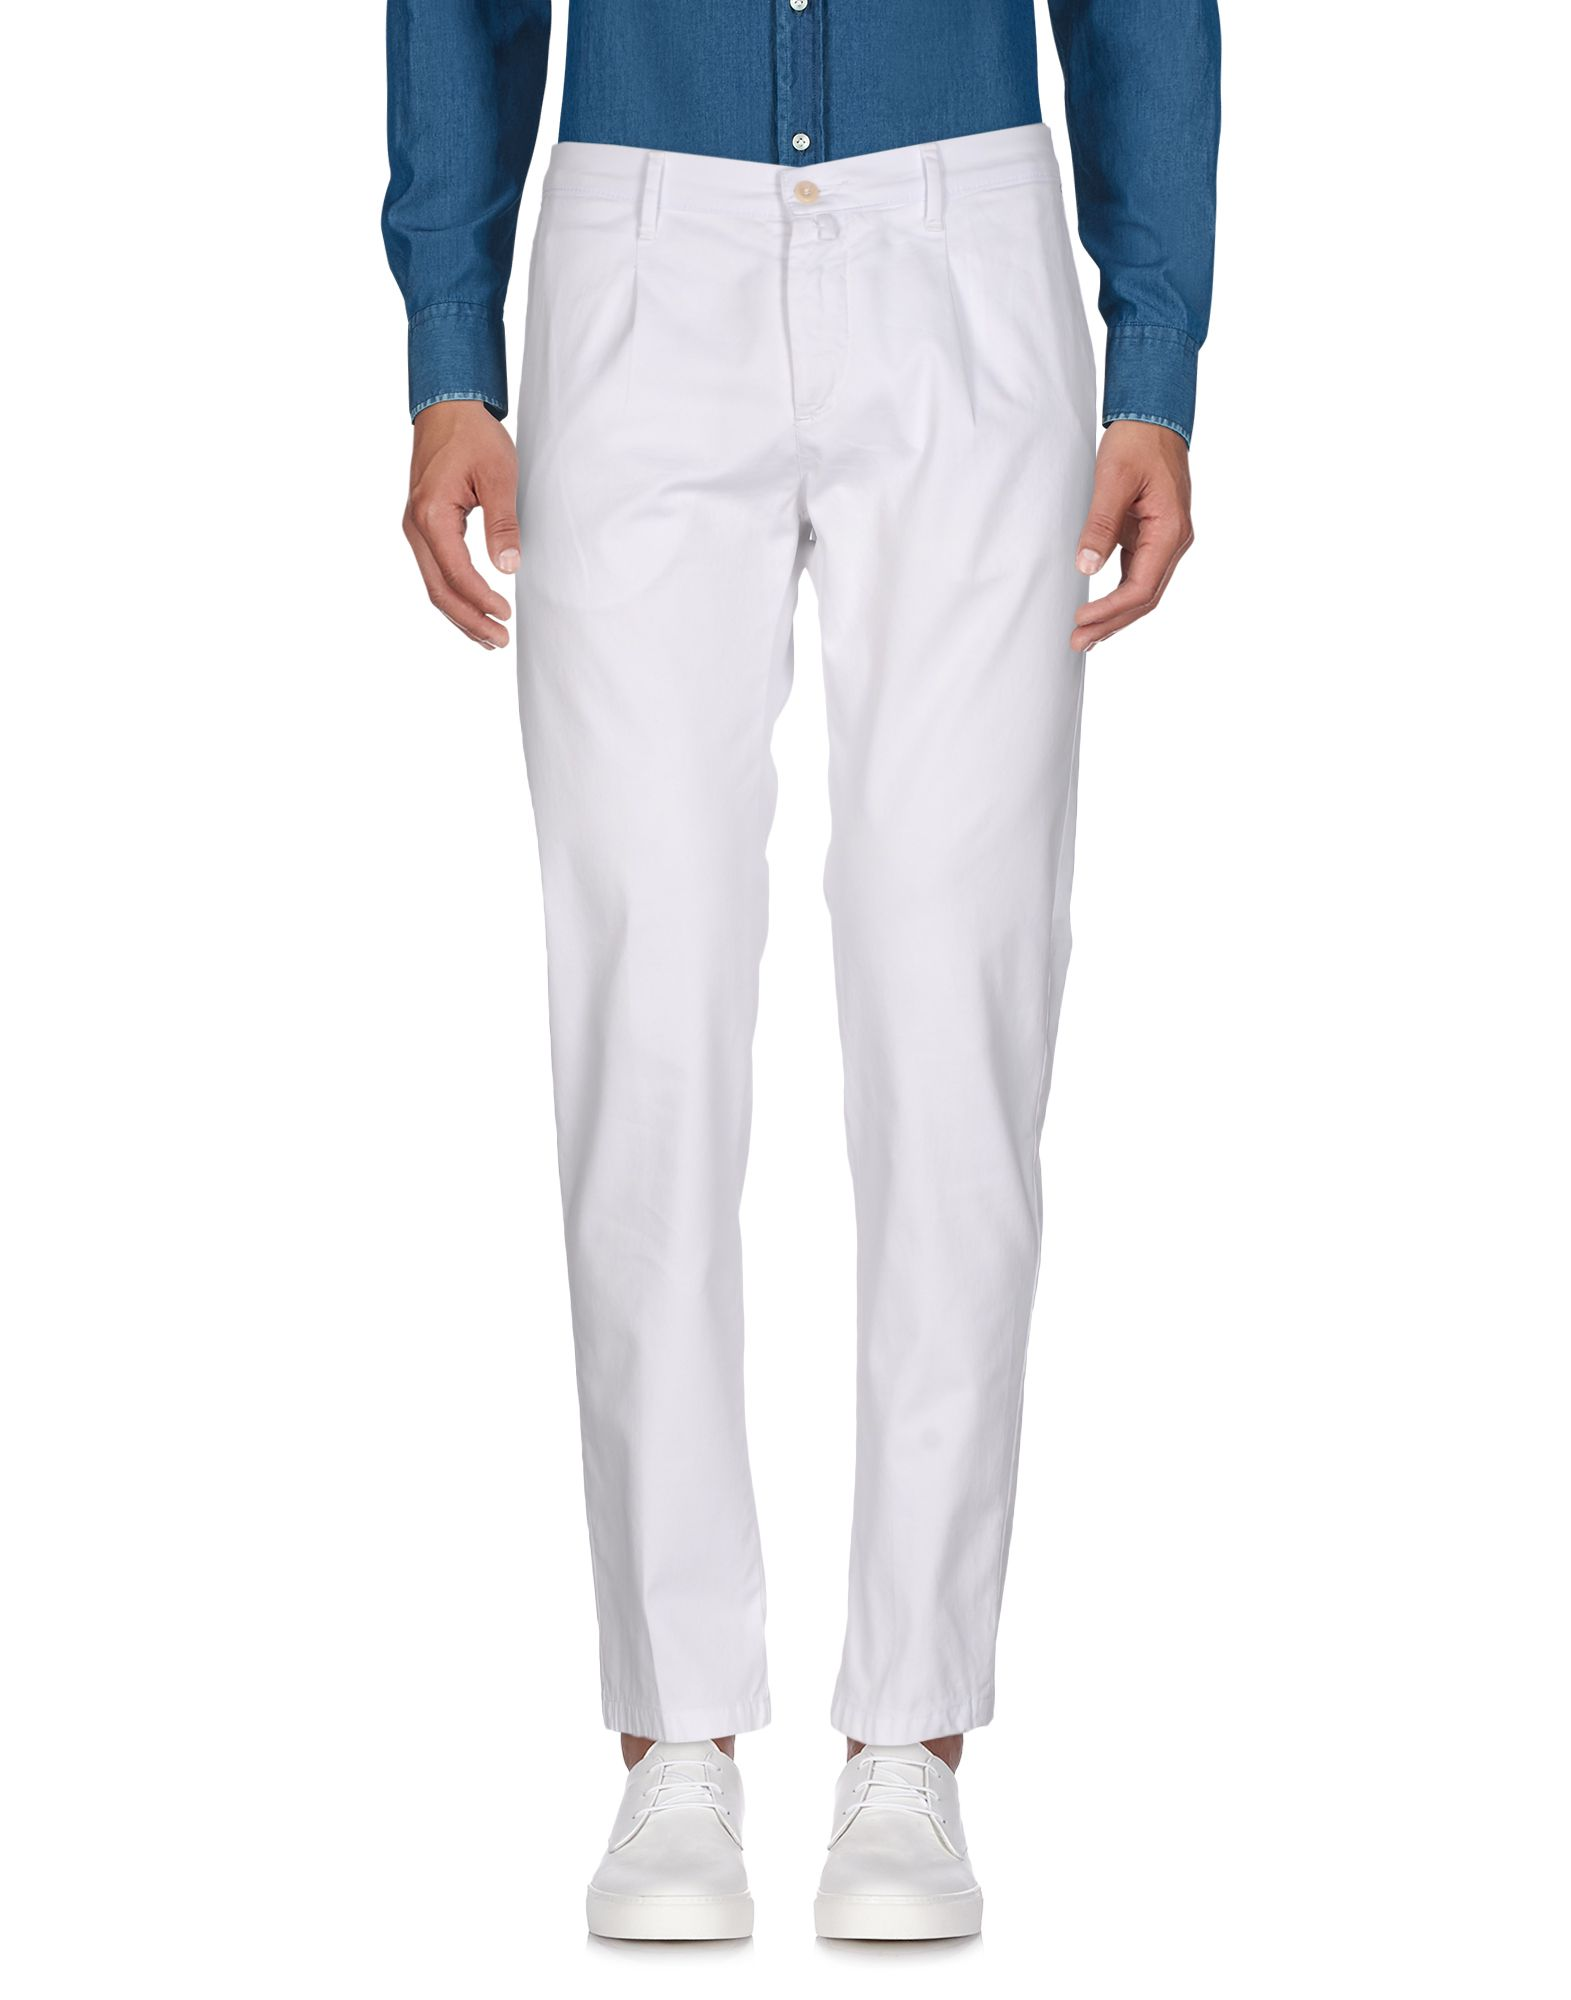 VICTOR COOL Повседневные брюки повседневные брюки song promise cool points 1603 x 8 2015